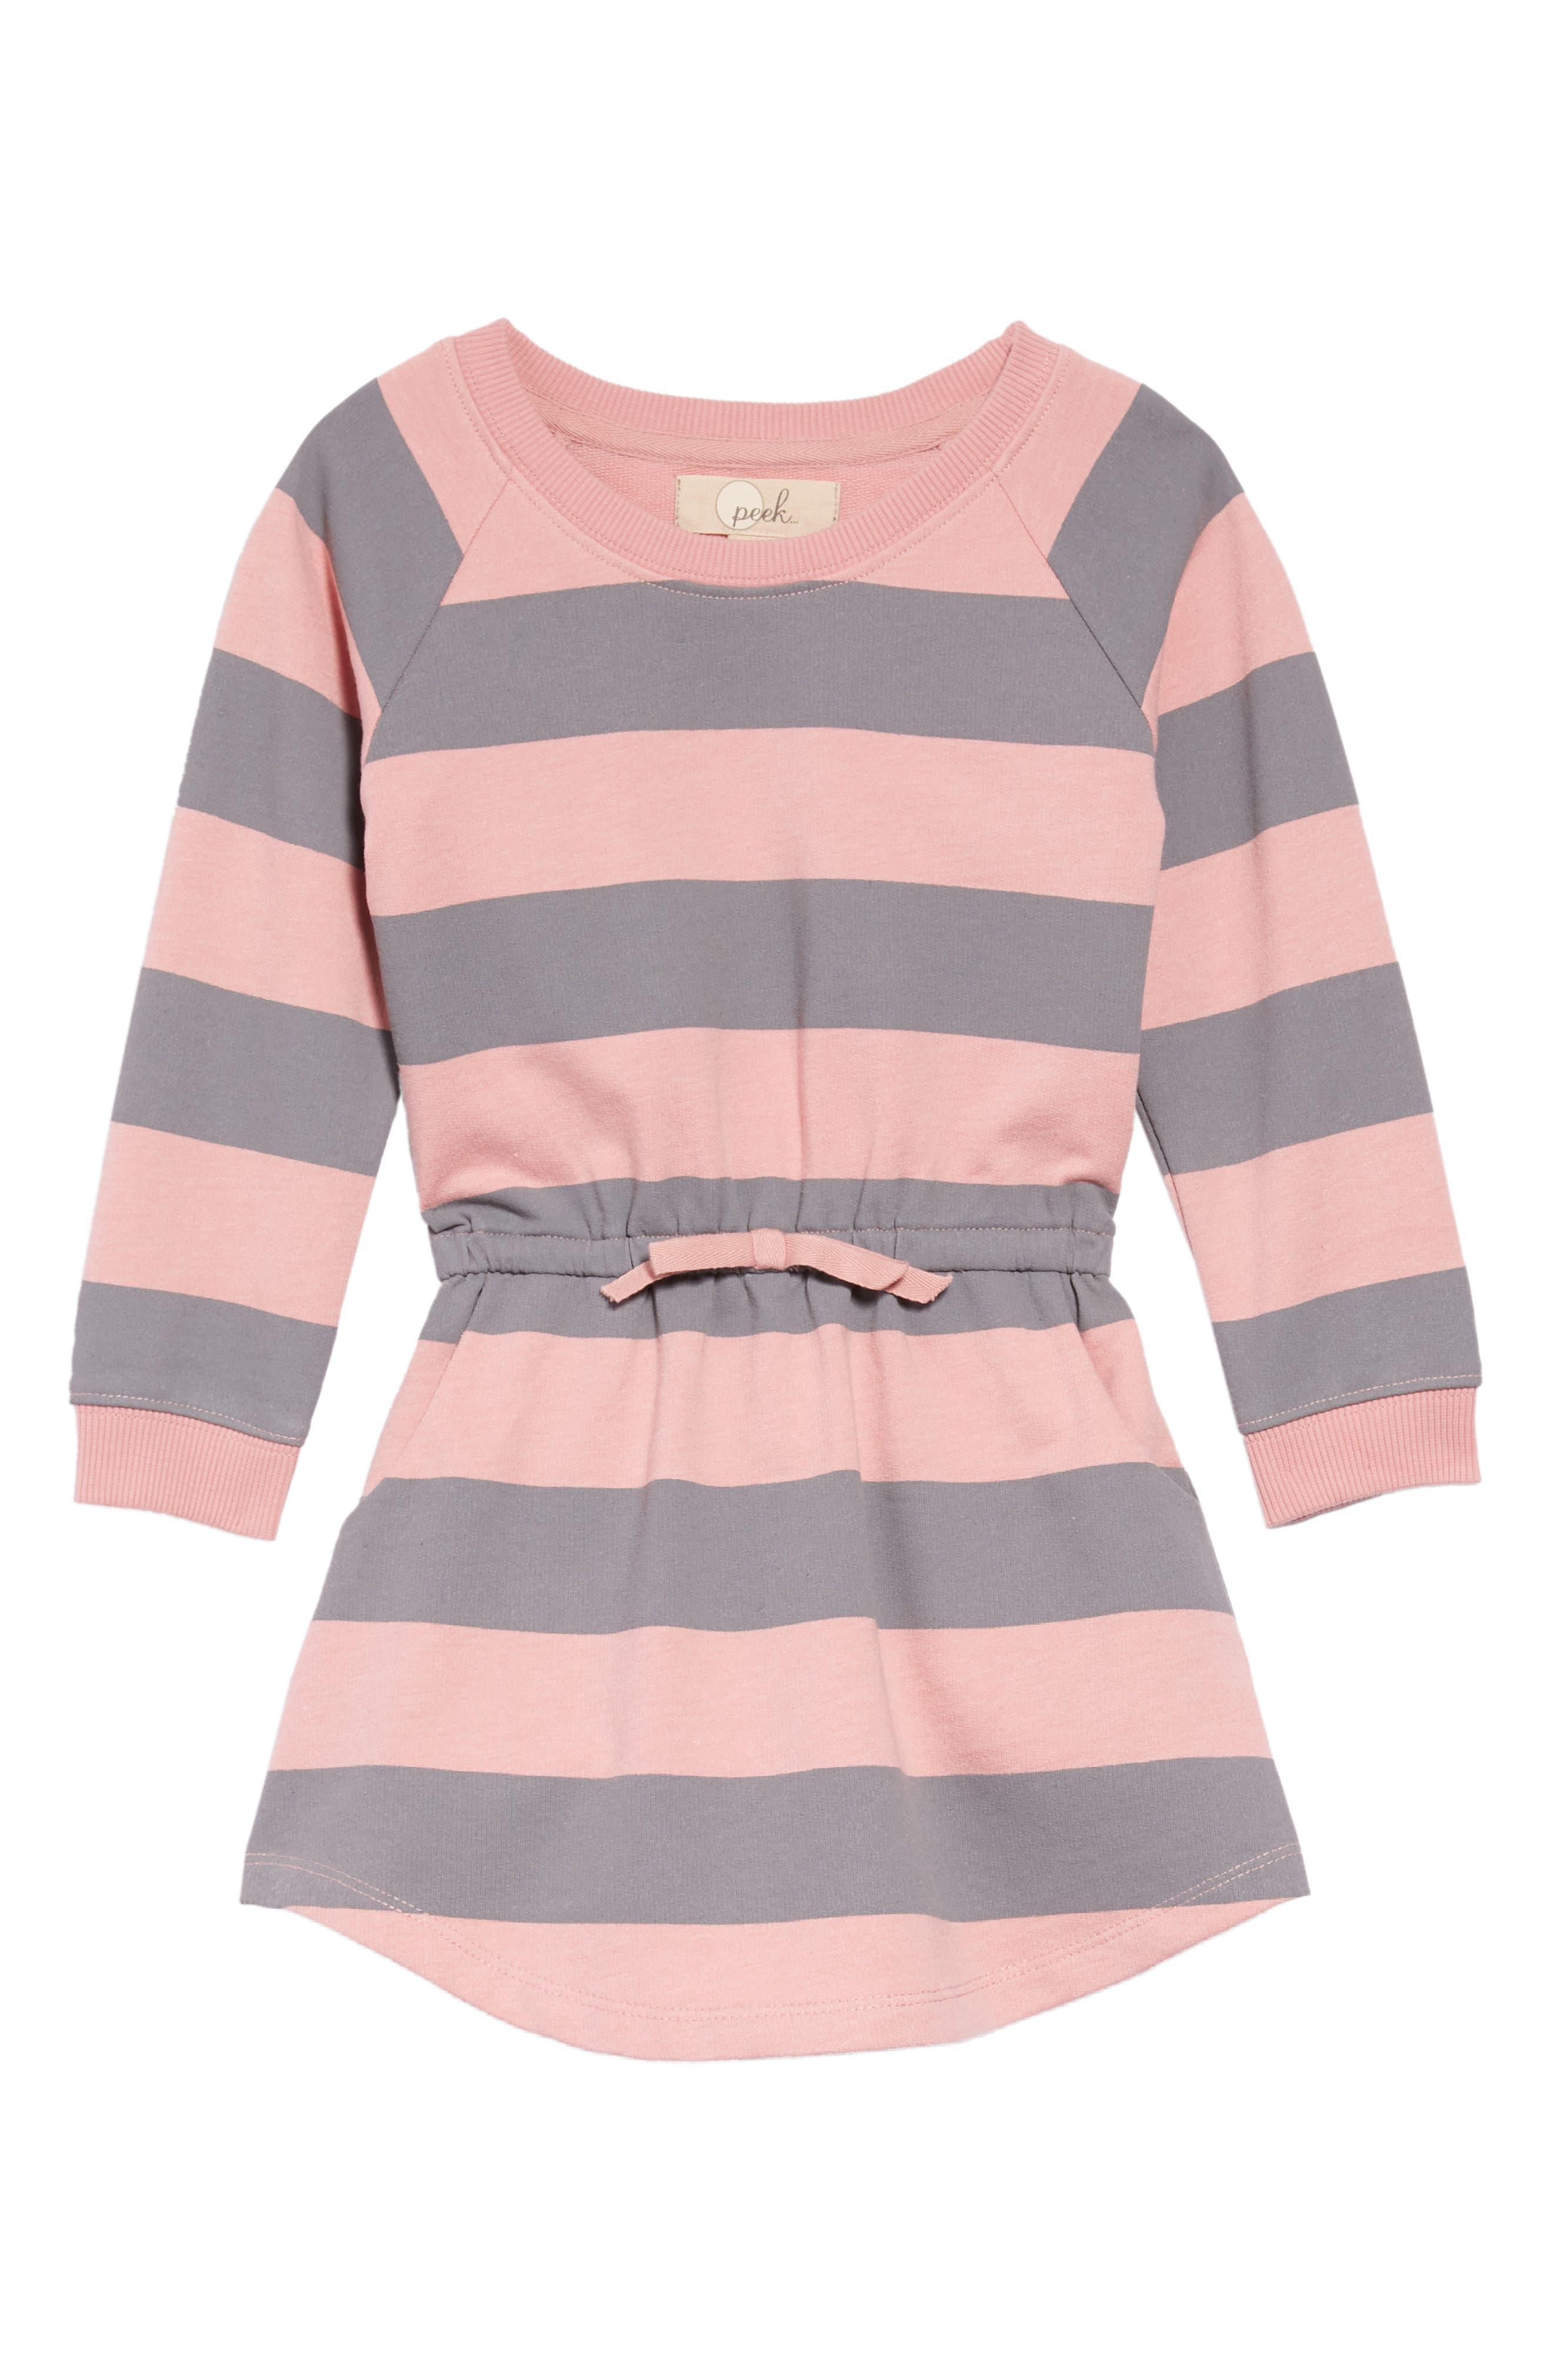 Peek Ruby Sweatshirt Dress,                         Main,                         color, 650